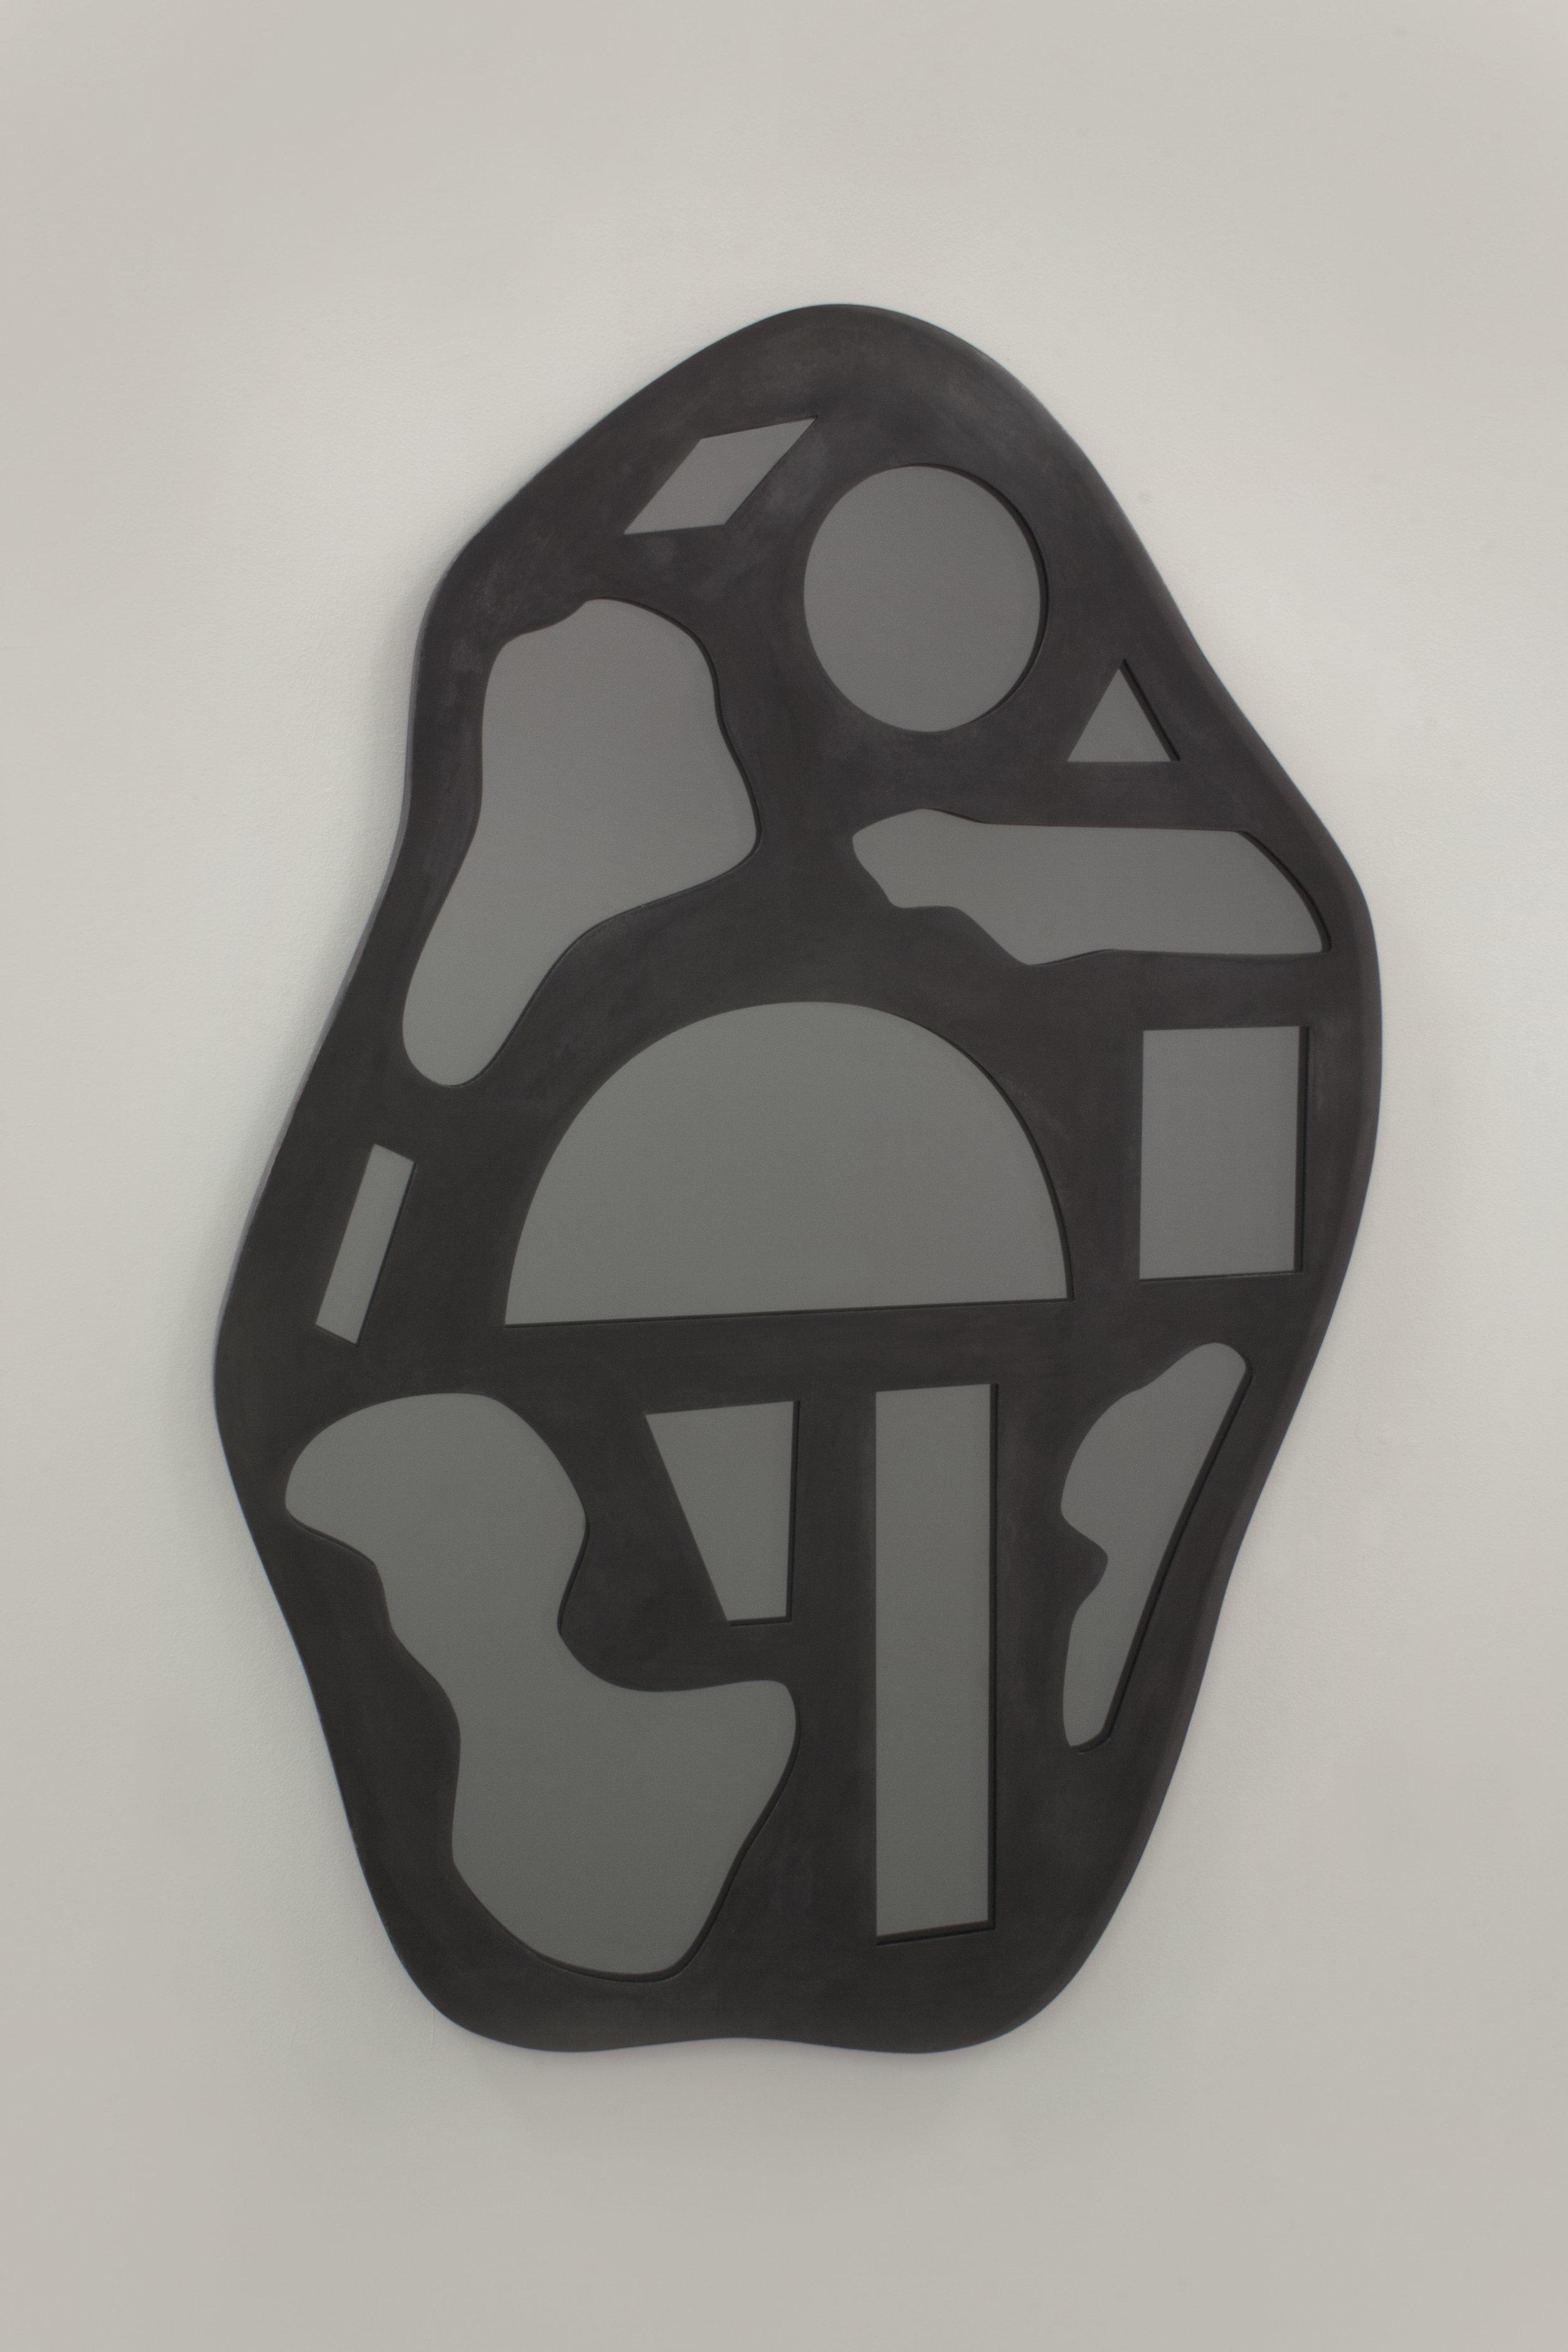 walac. studio graphic collectible mirror, blackened steel